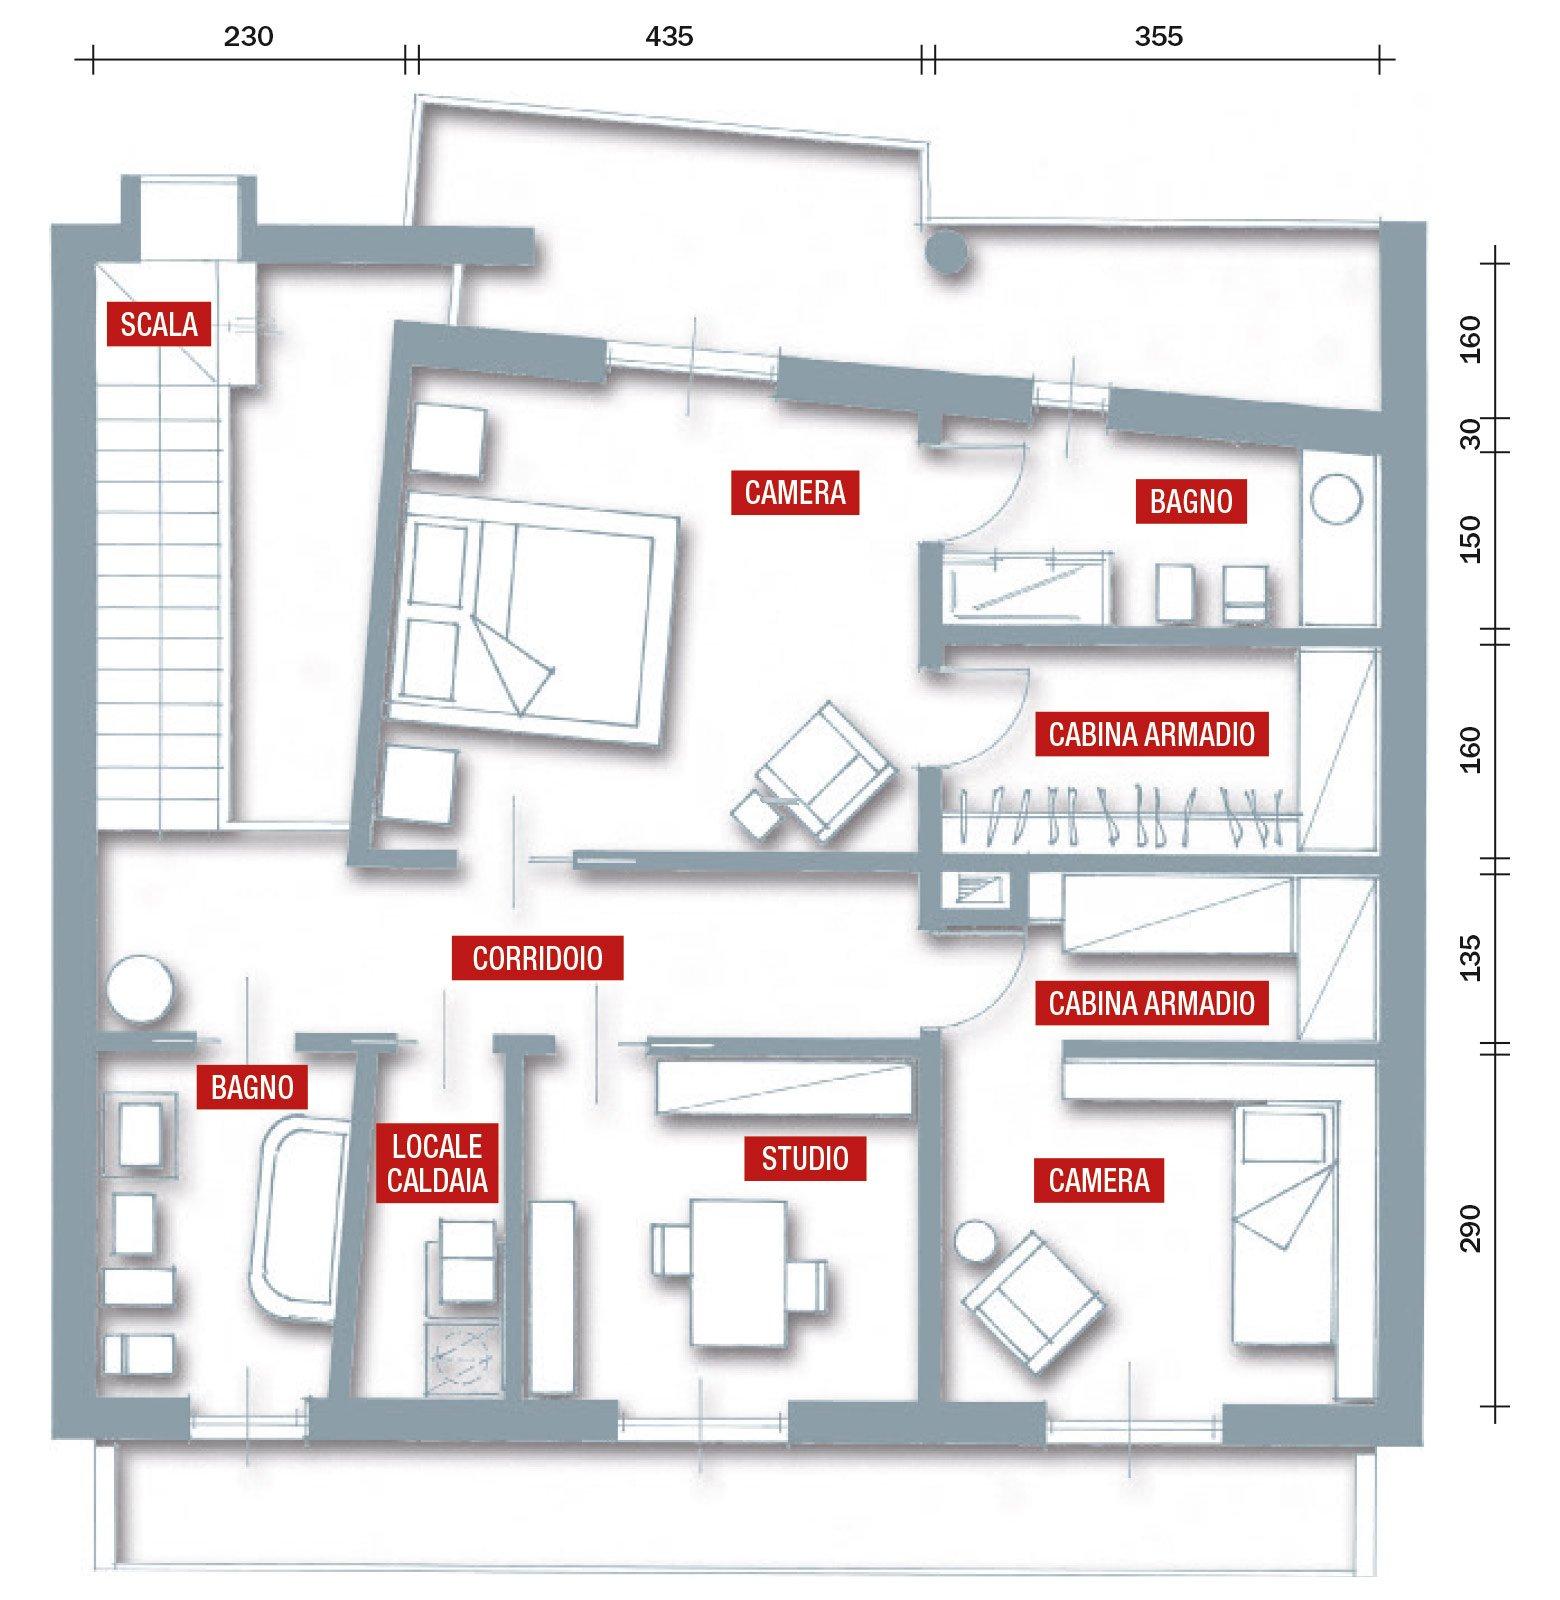 Piante di case moderne px67 regardsdefemmes for Planimetrie per case di 3000 piedi quadrati